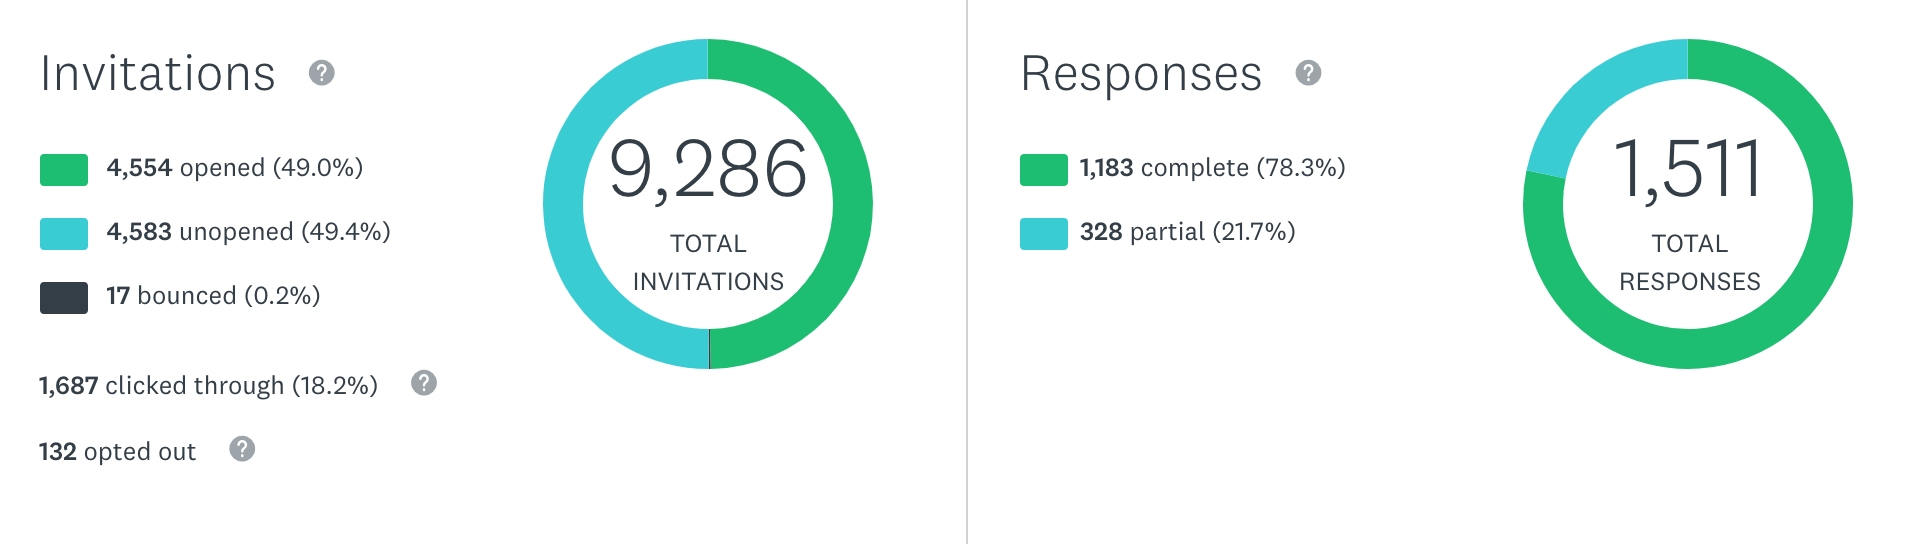 Survey invitations VS responses